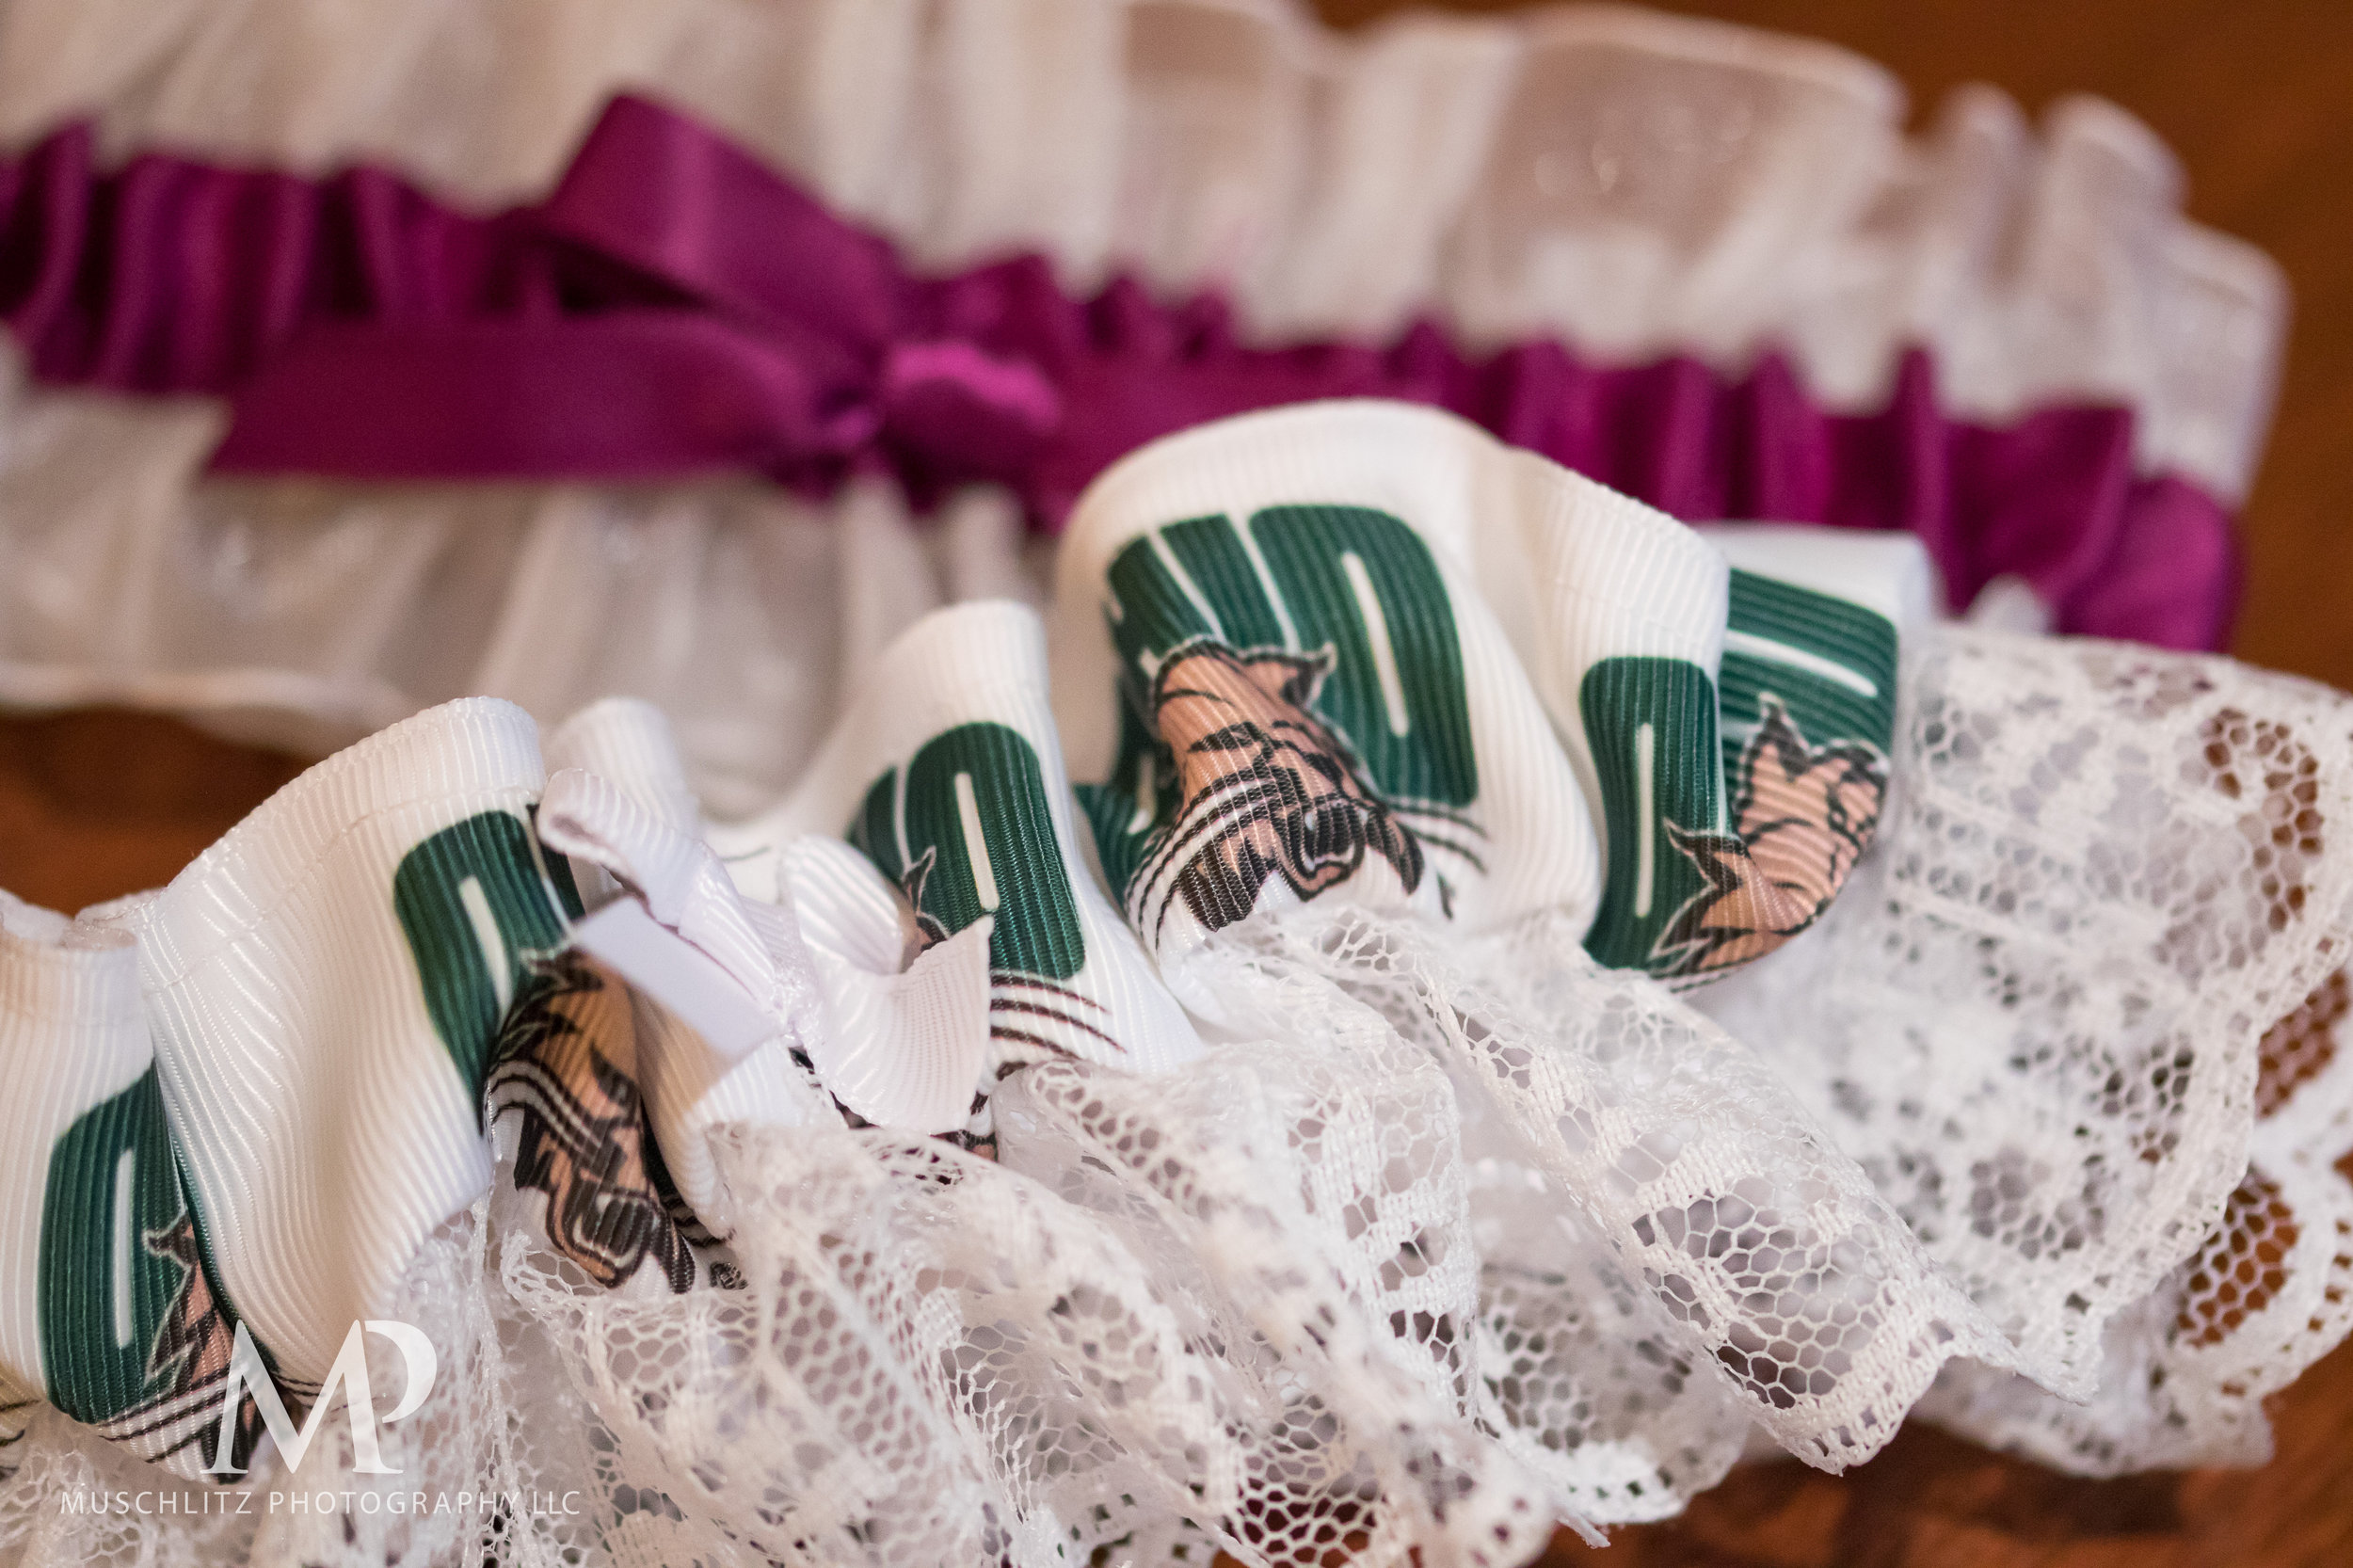 club-at-corazon-wedding-ceremony-reception-columbus-dublin-ohio-ohio-university-theme-012.JPG